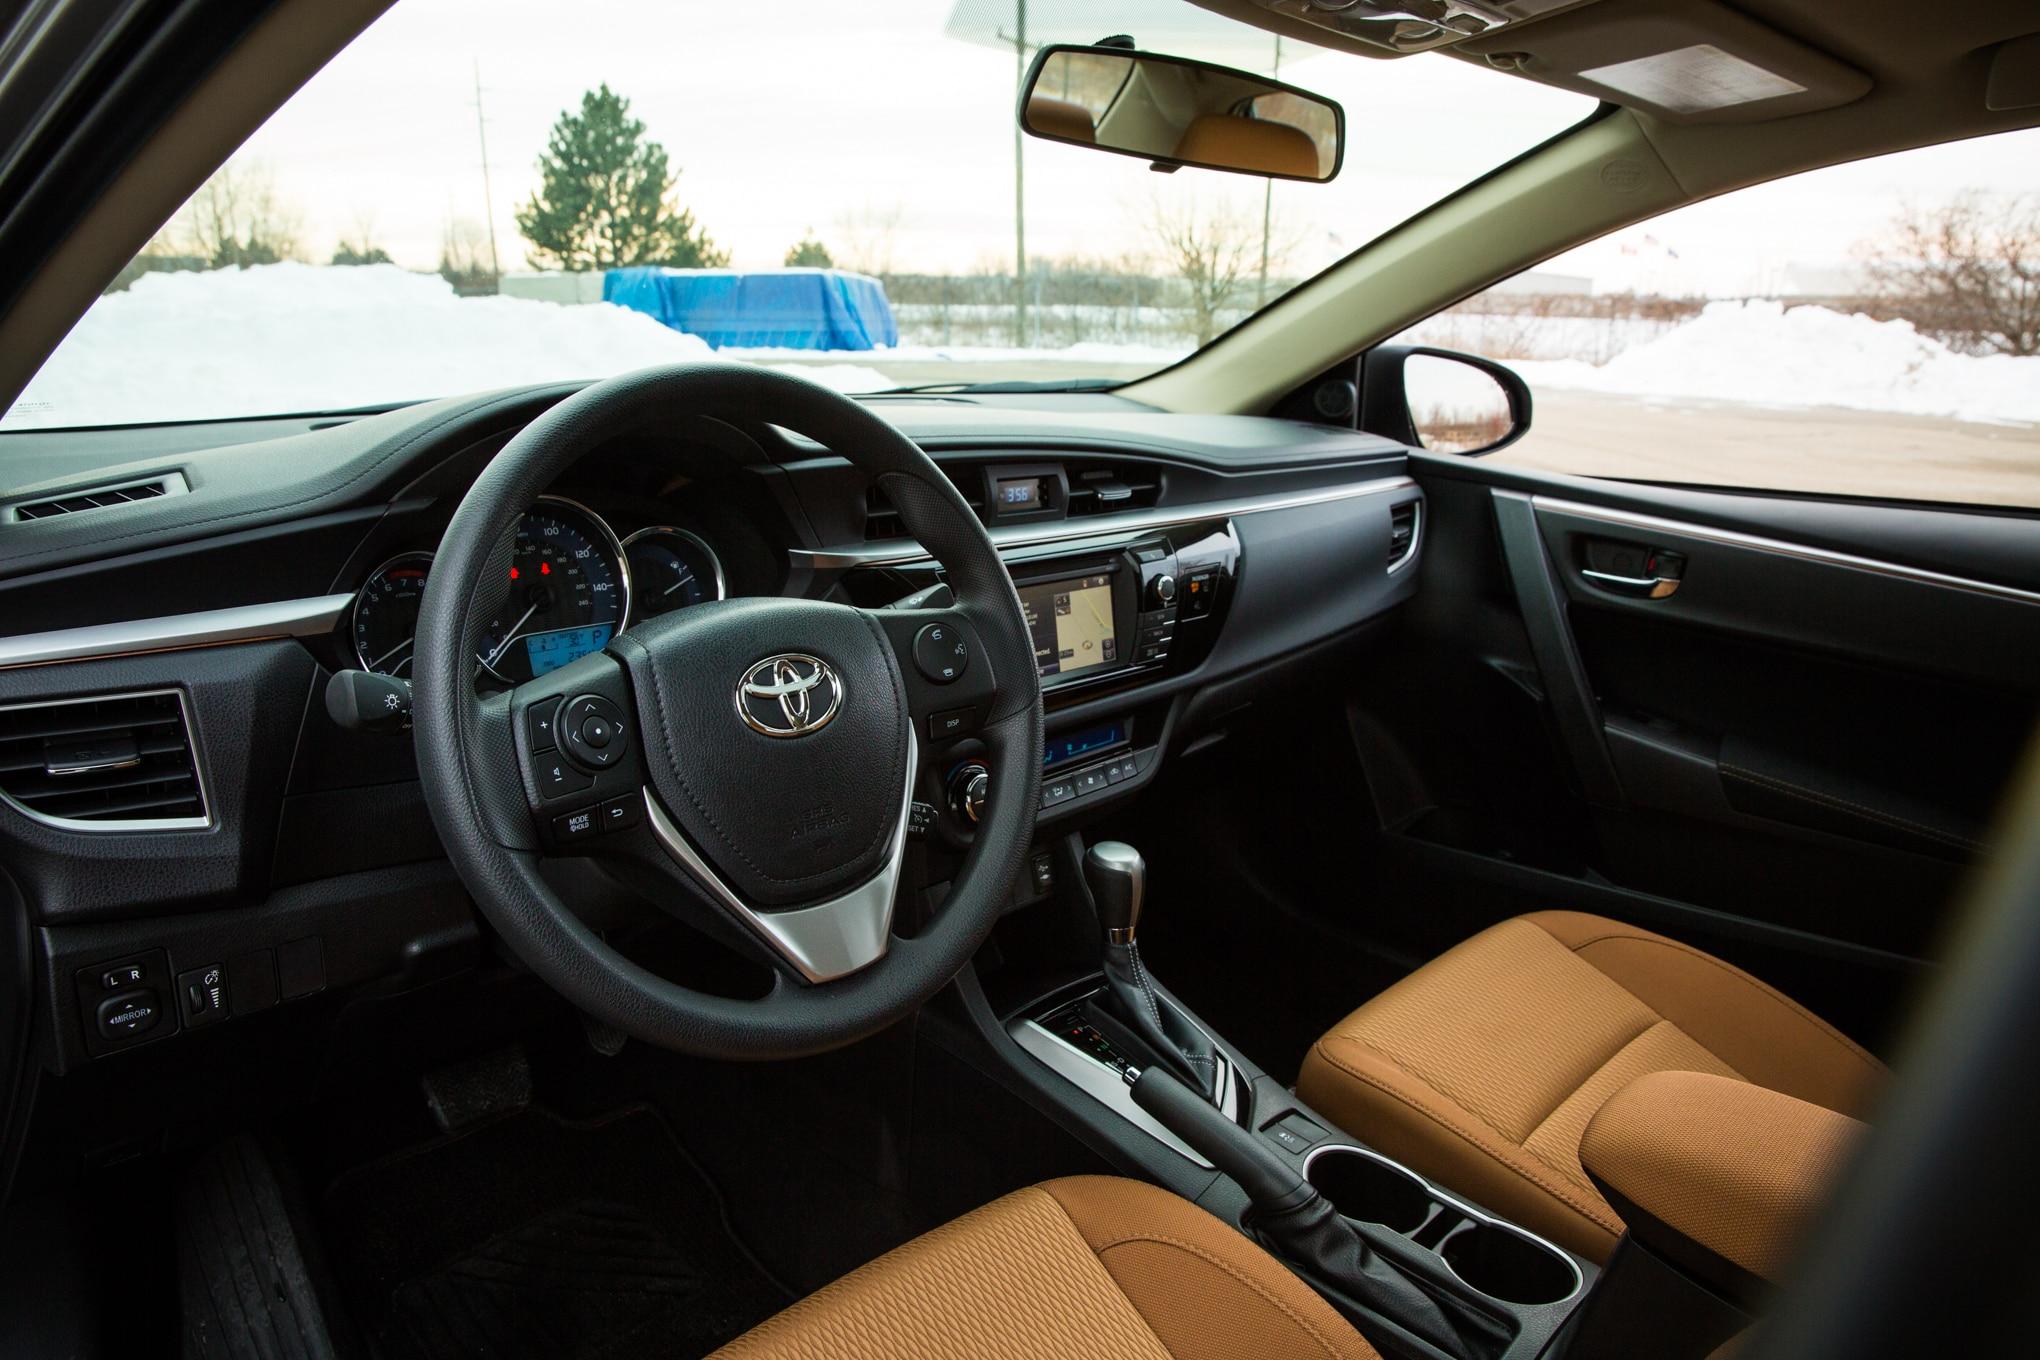 Toyota appliance battle yaris ia vs for Interior toyota corolla